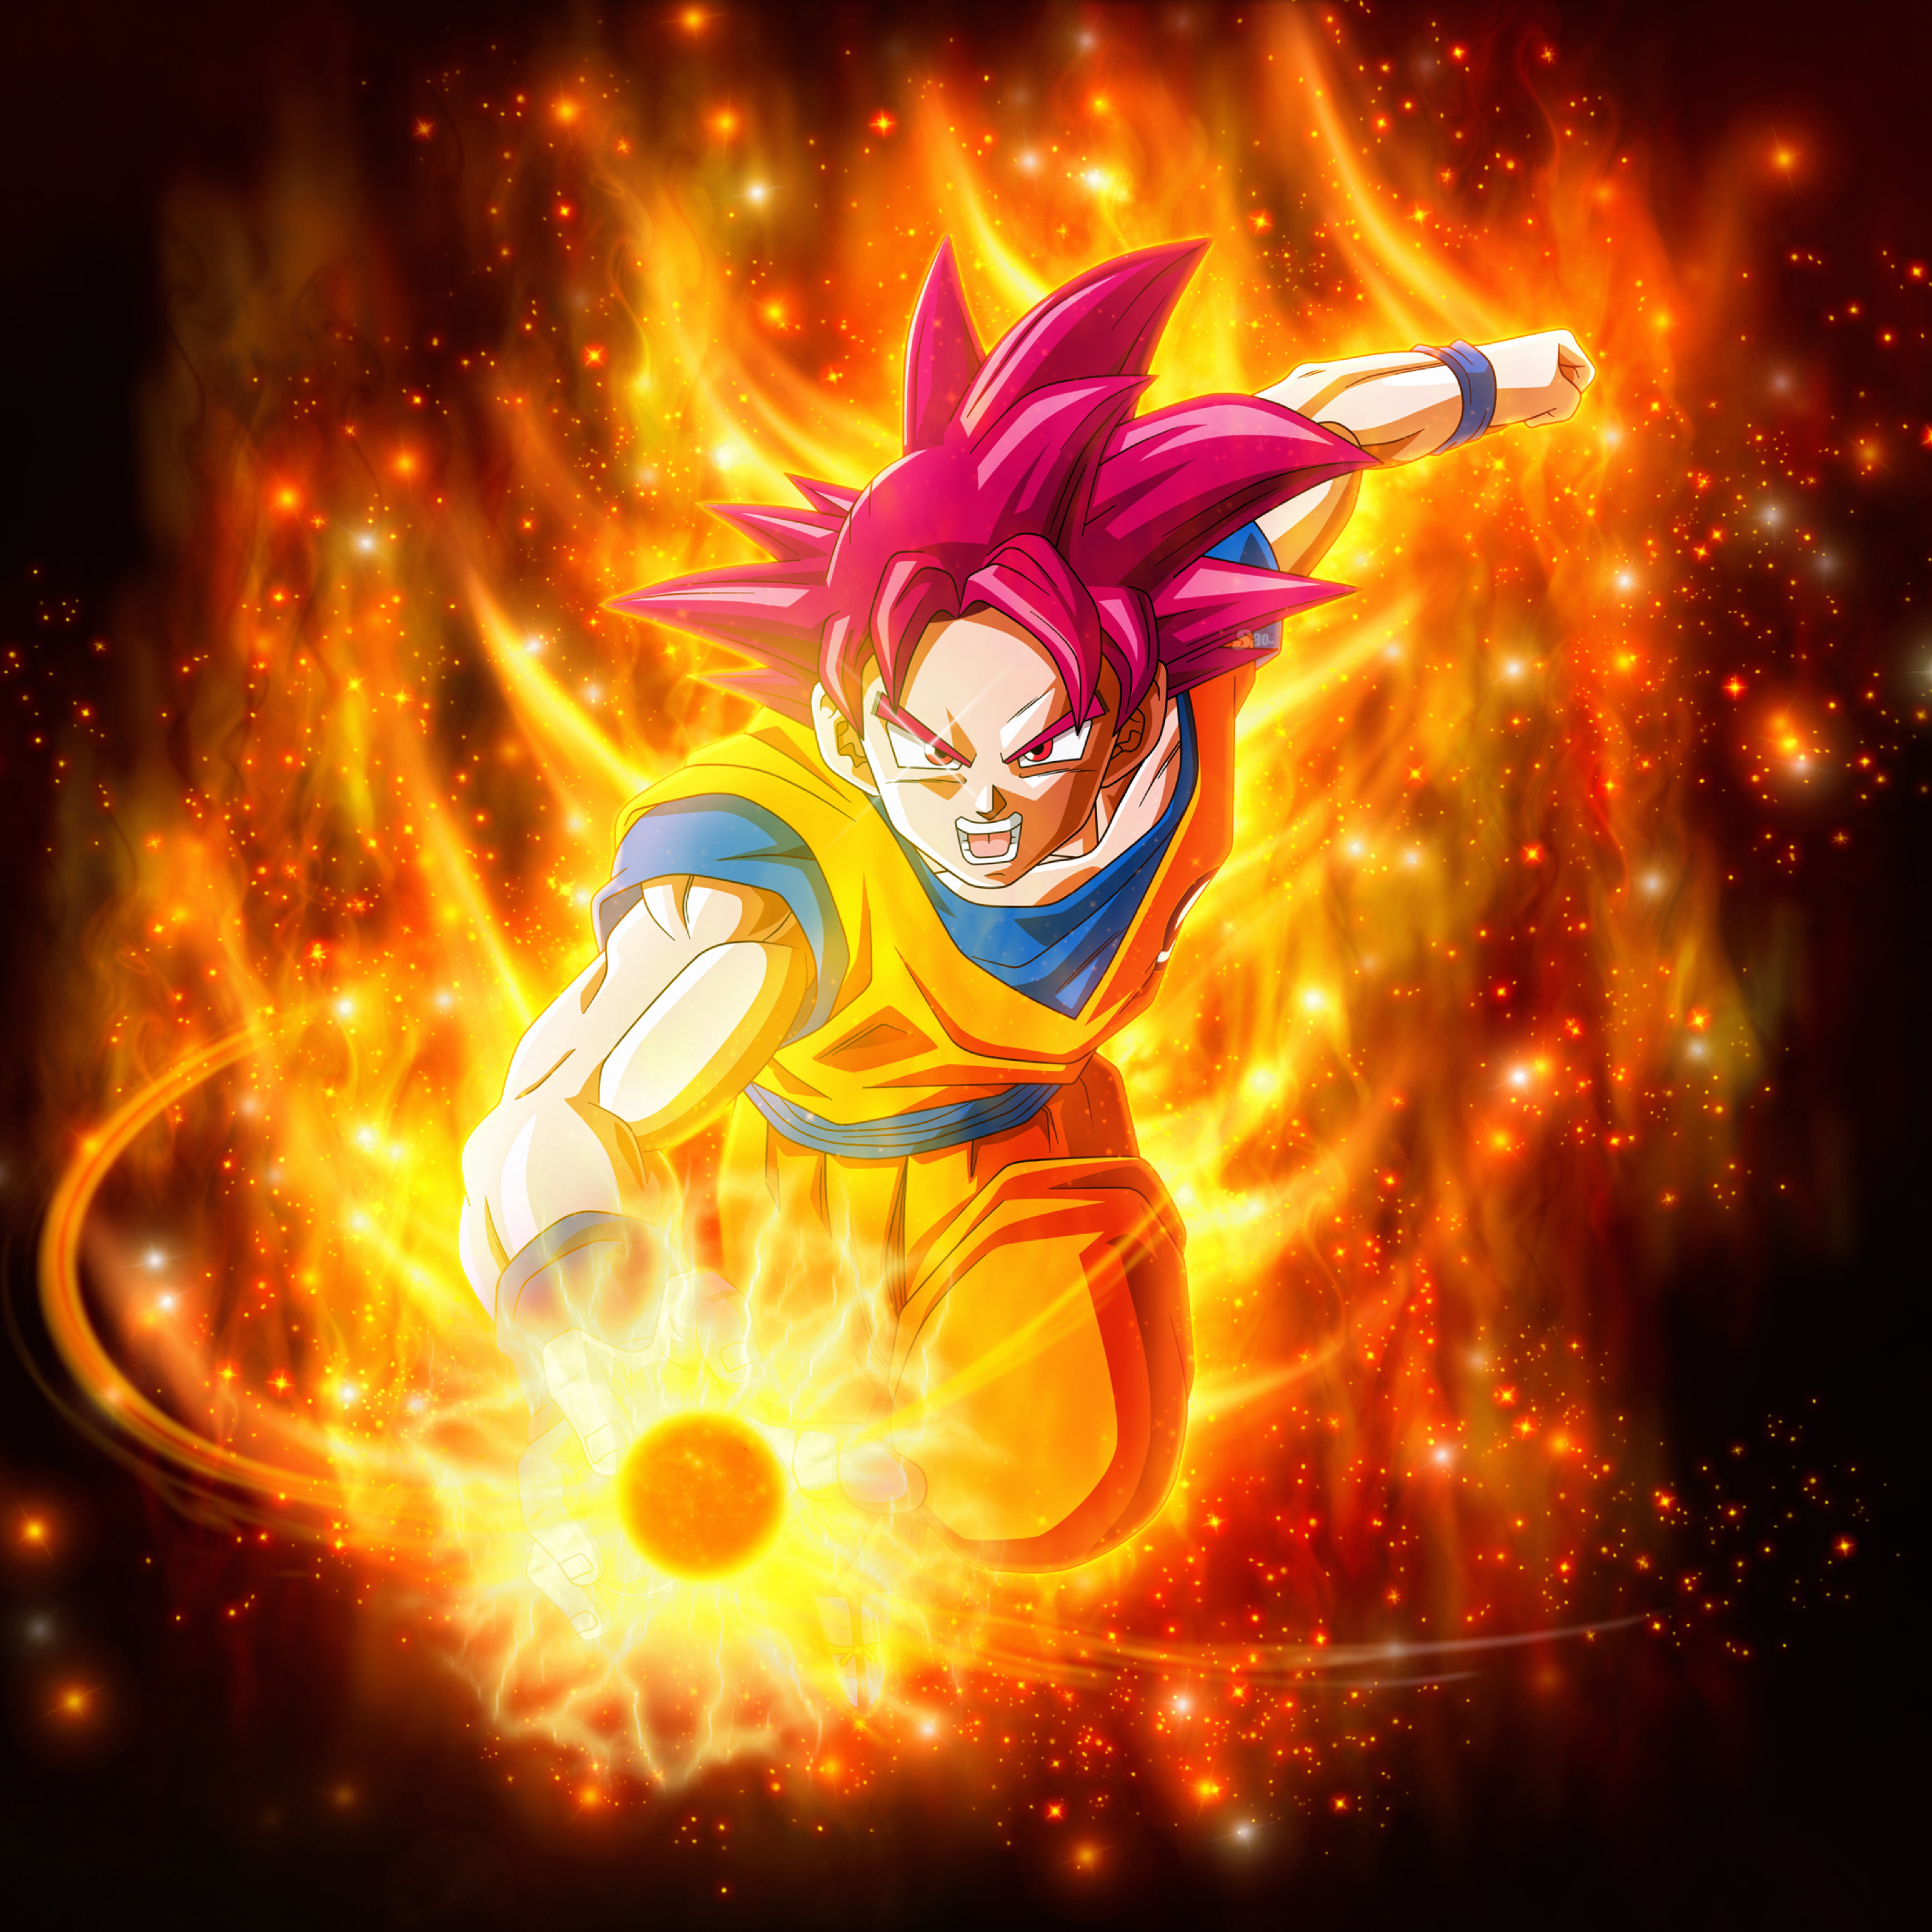 Super Saiyan God Dragon Ball Super Super, HD 4K Wallpaper